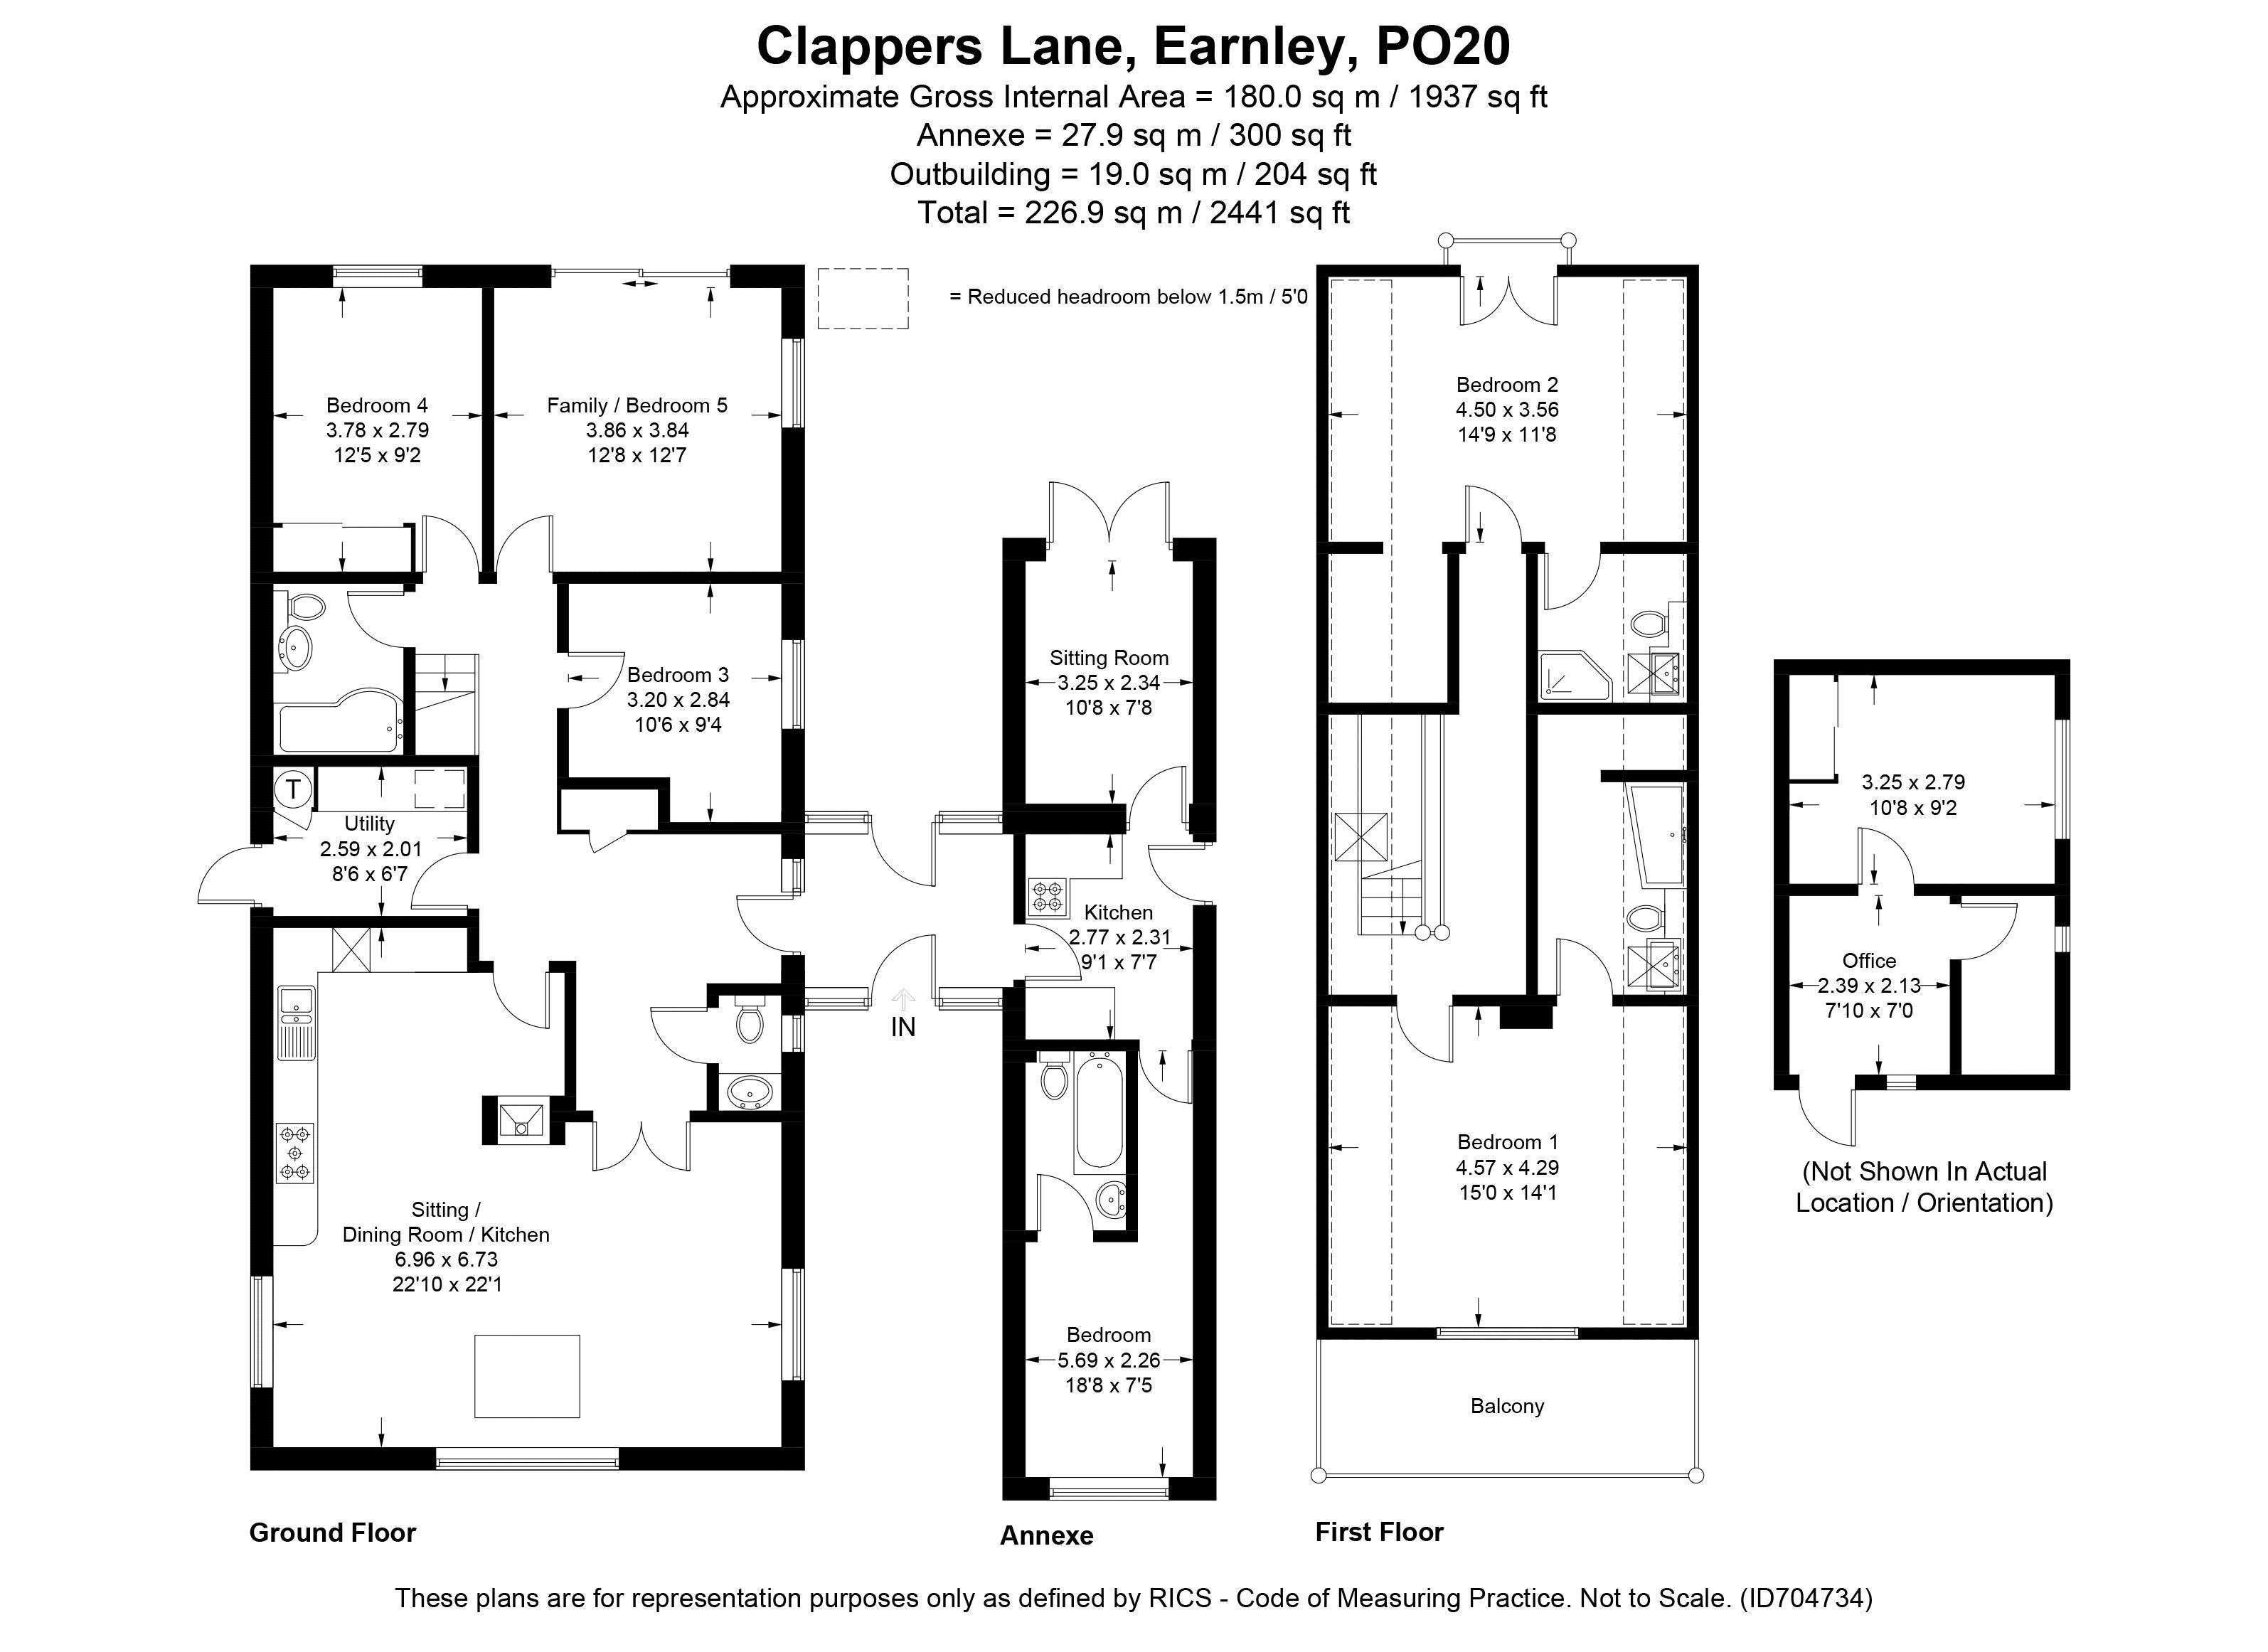 Clappers Lane Earnley